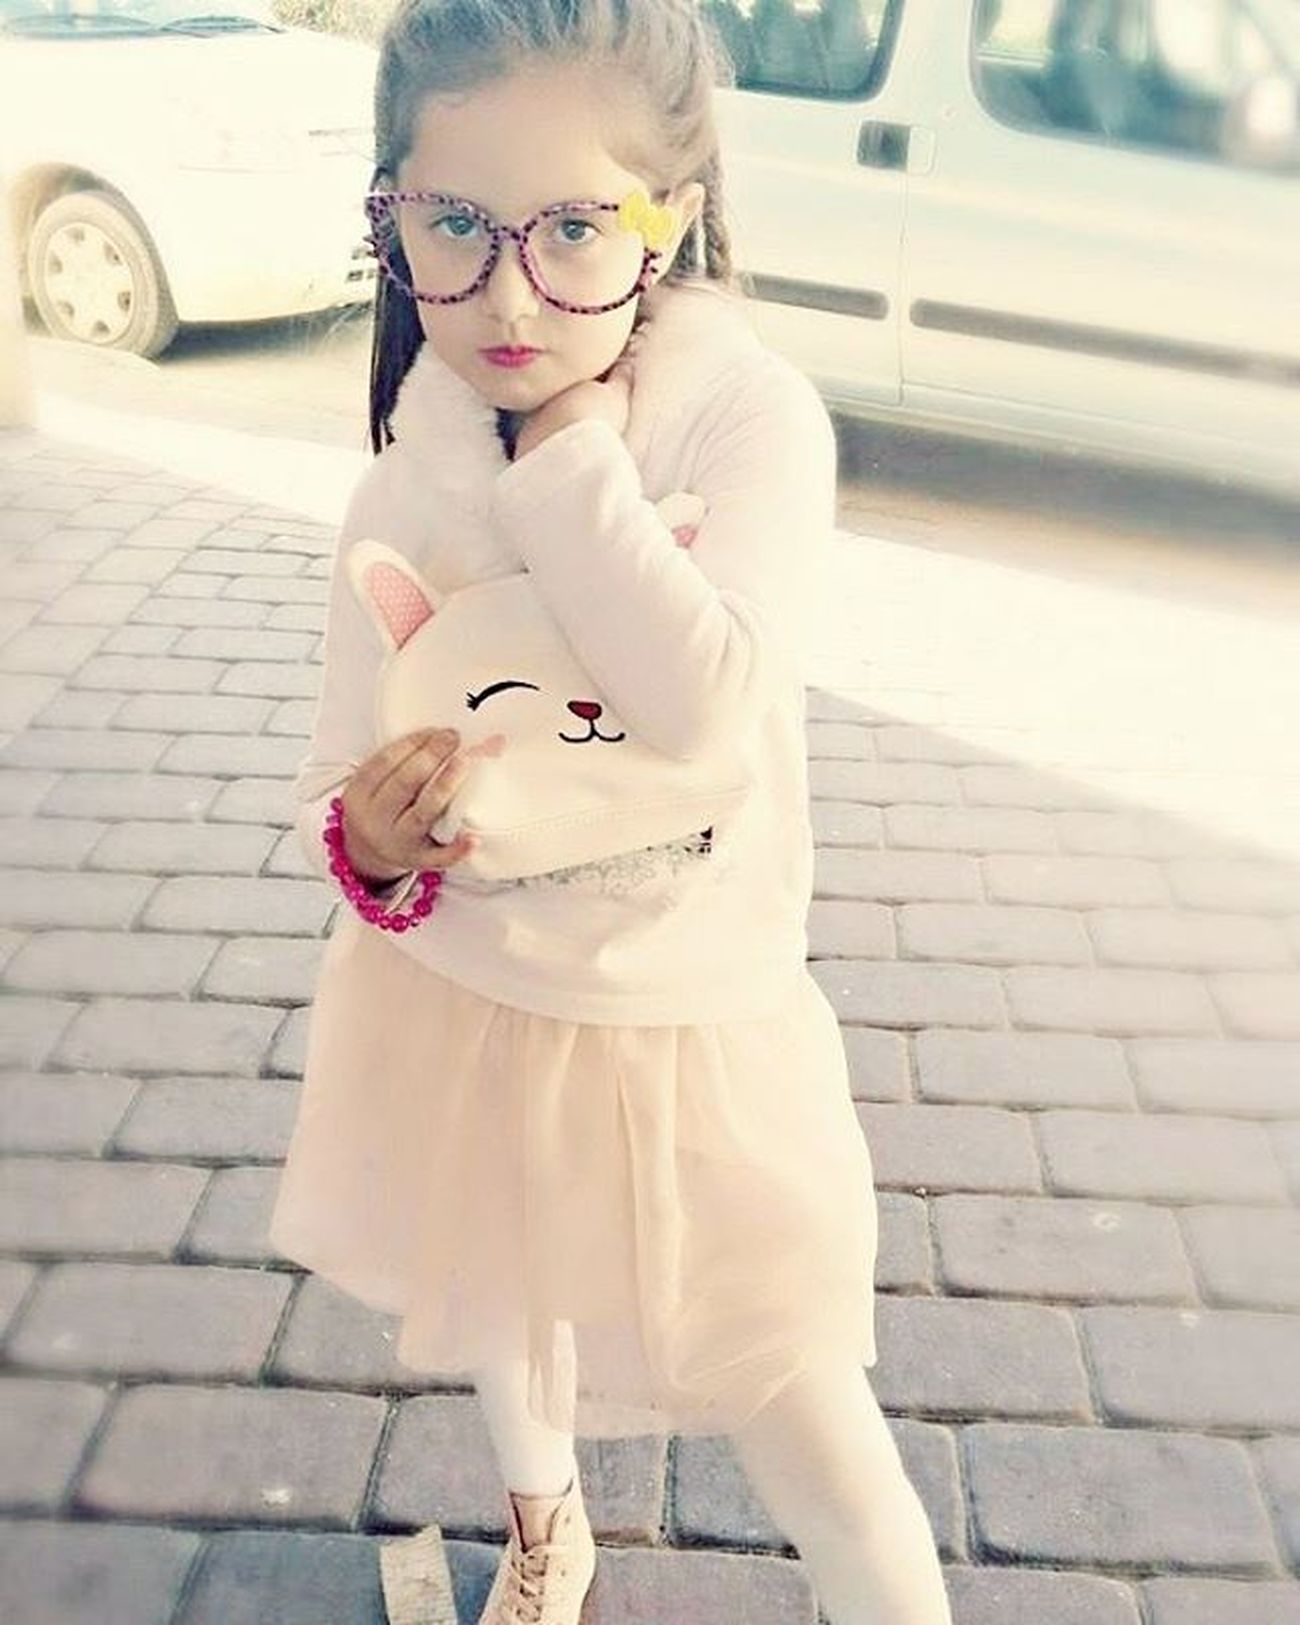 I love skirts 😊😄😘 Hello Baby Love Rabbit Rabbits Rabbitstagram Pink Pinkbeba Cute Socute Beautifle Girl Beautifulgirl Cutegirl Kid Fashionkids Cutekid Lookday Lookoftheday Style Stylekid Stylegirl Hair Hairstyle White glasses fashionglasses likeme followme skirt